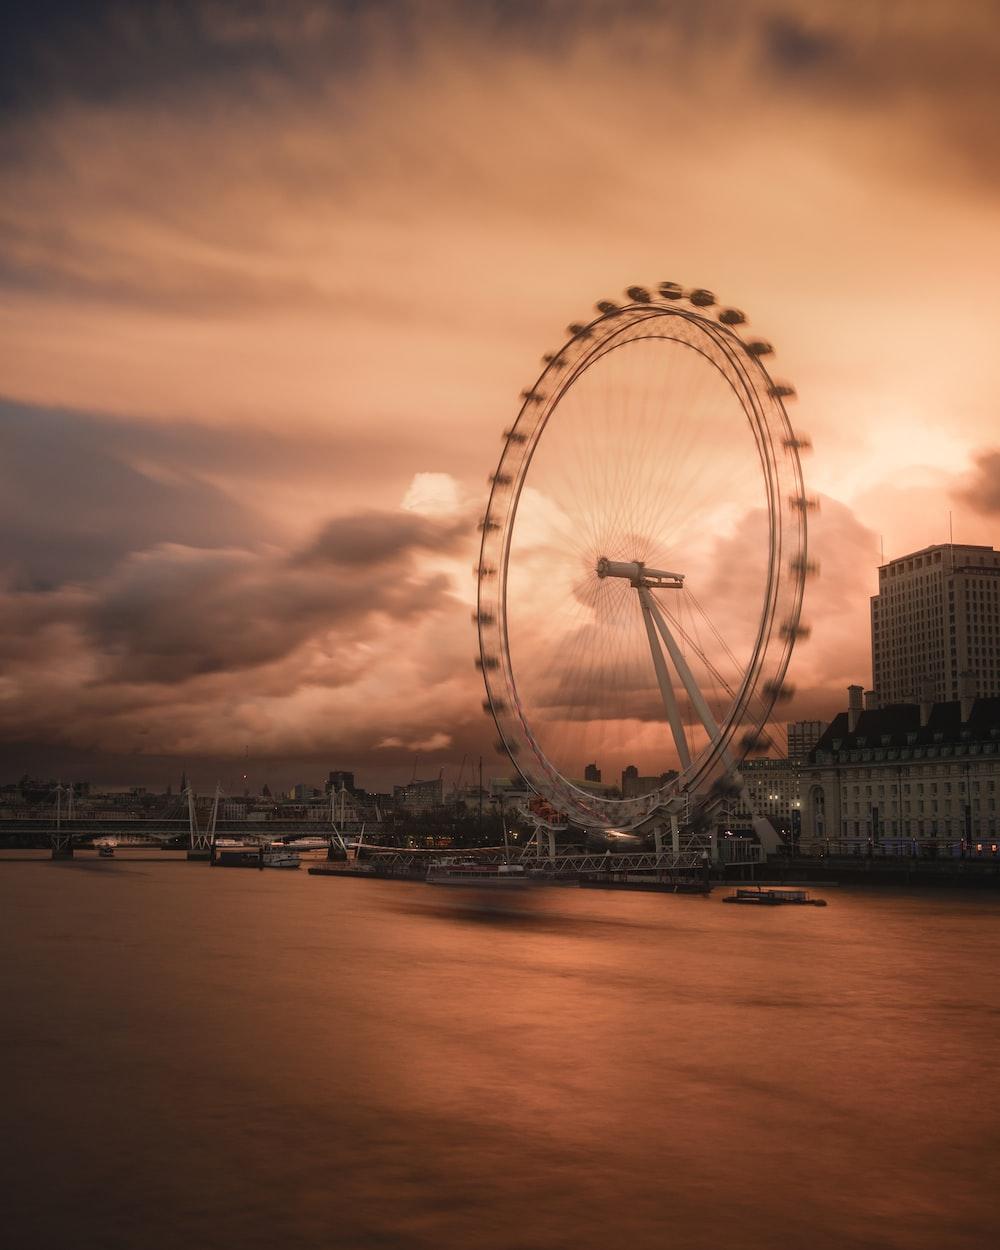 Ferris wheel during golden hour